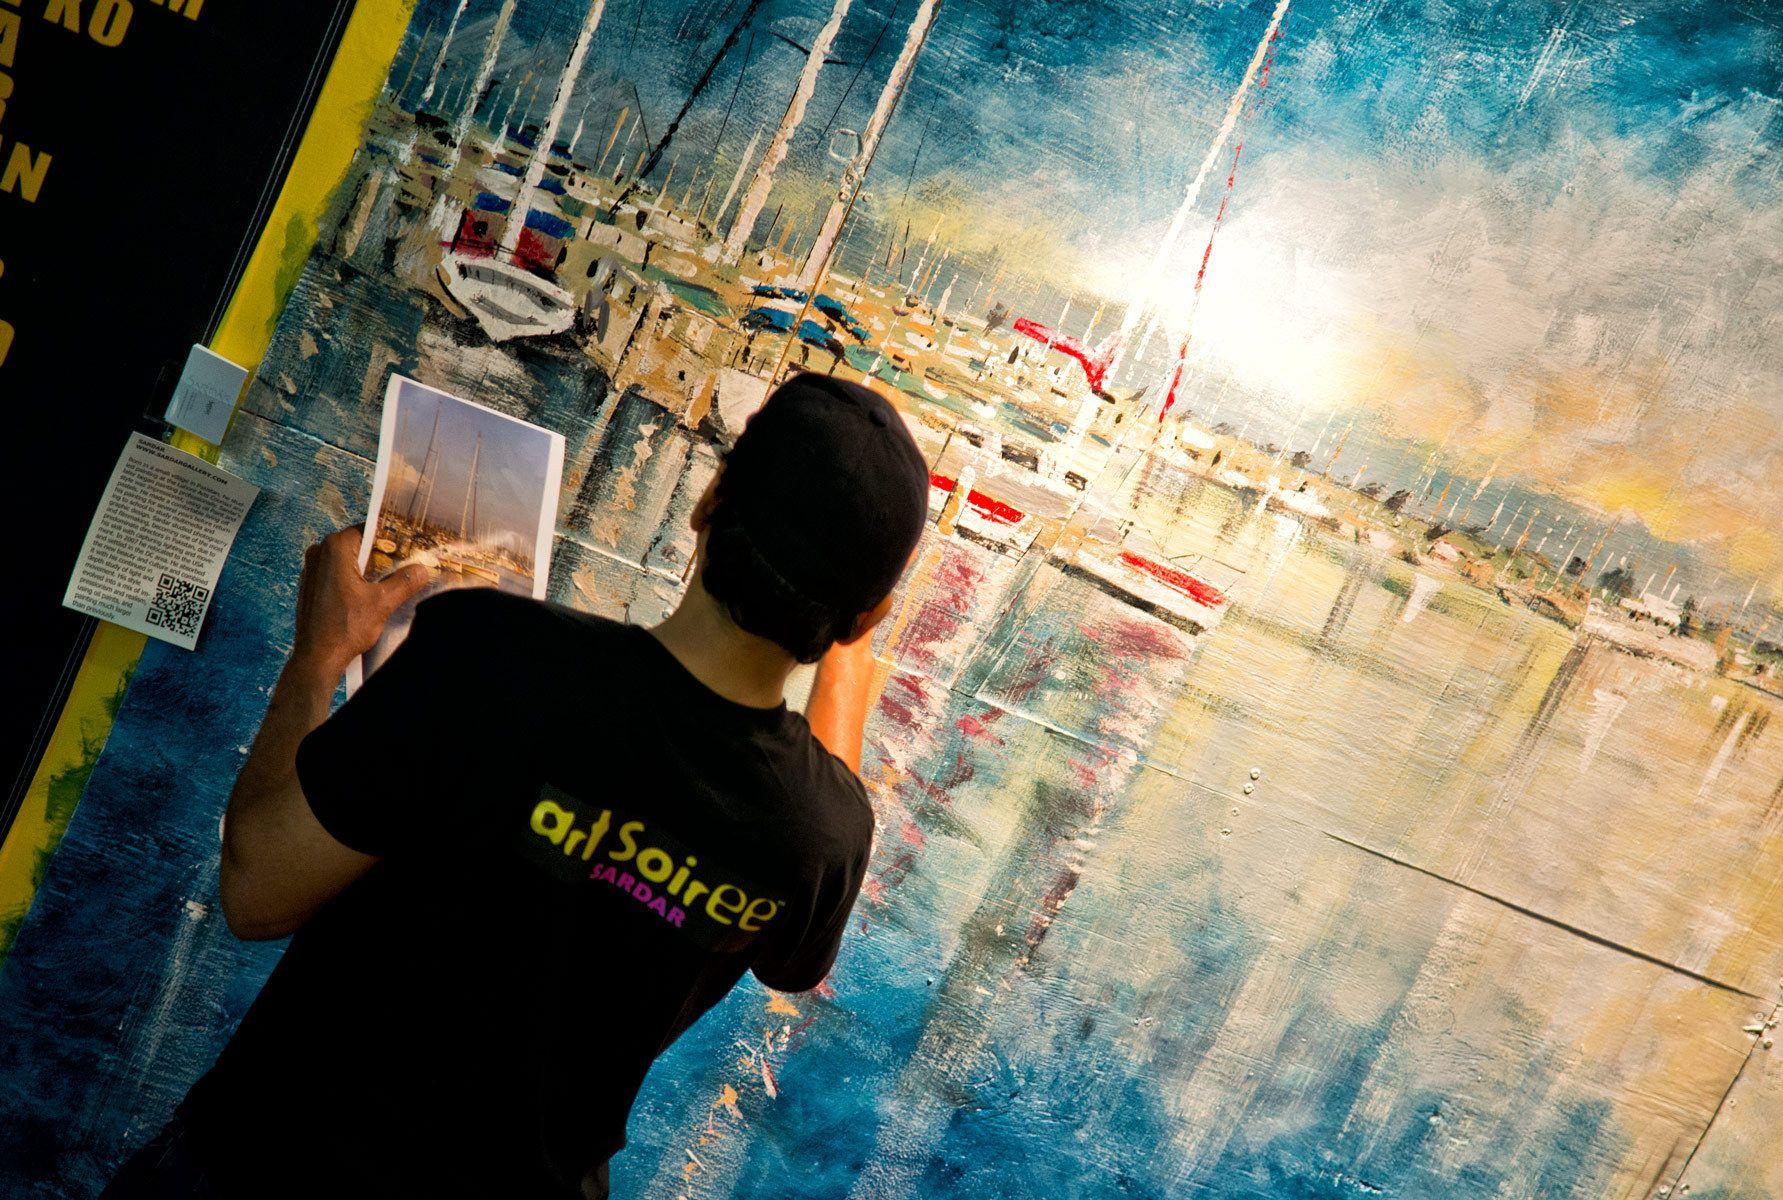 Artist painting in Washington Harbor